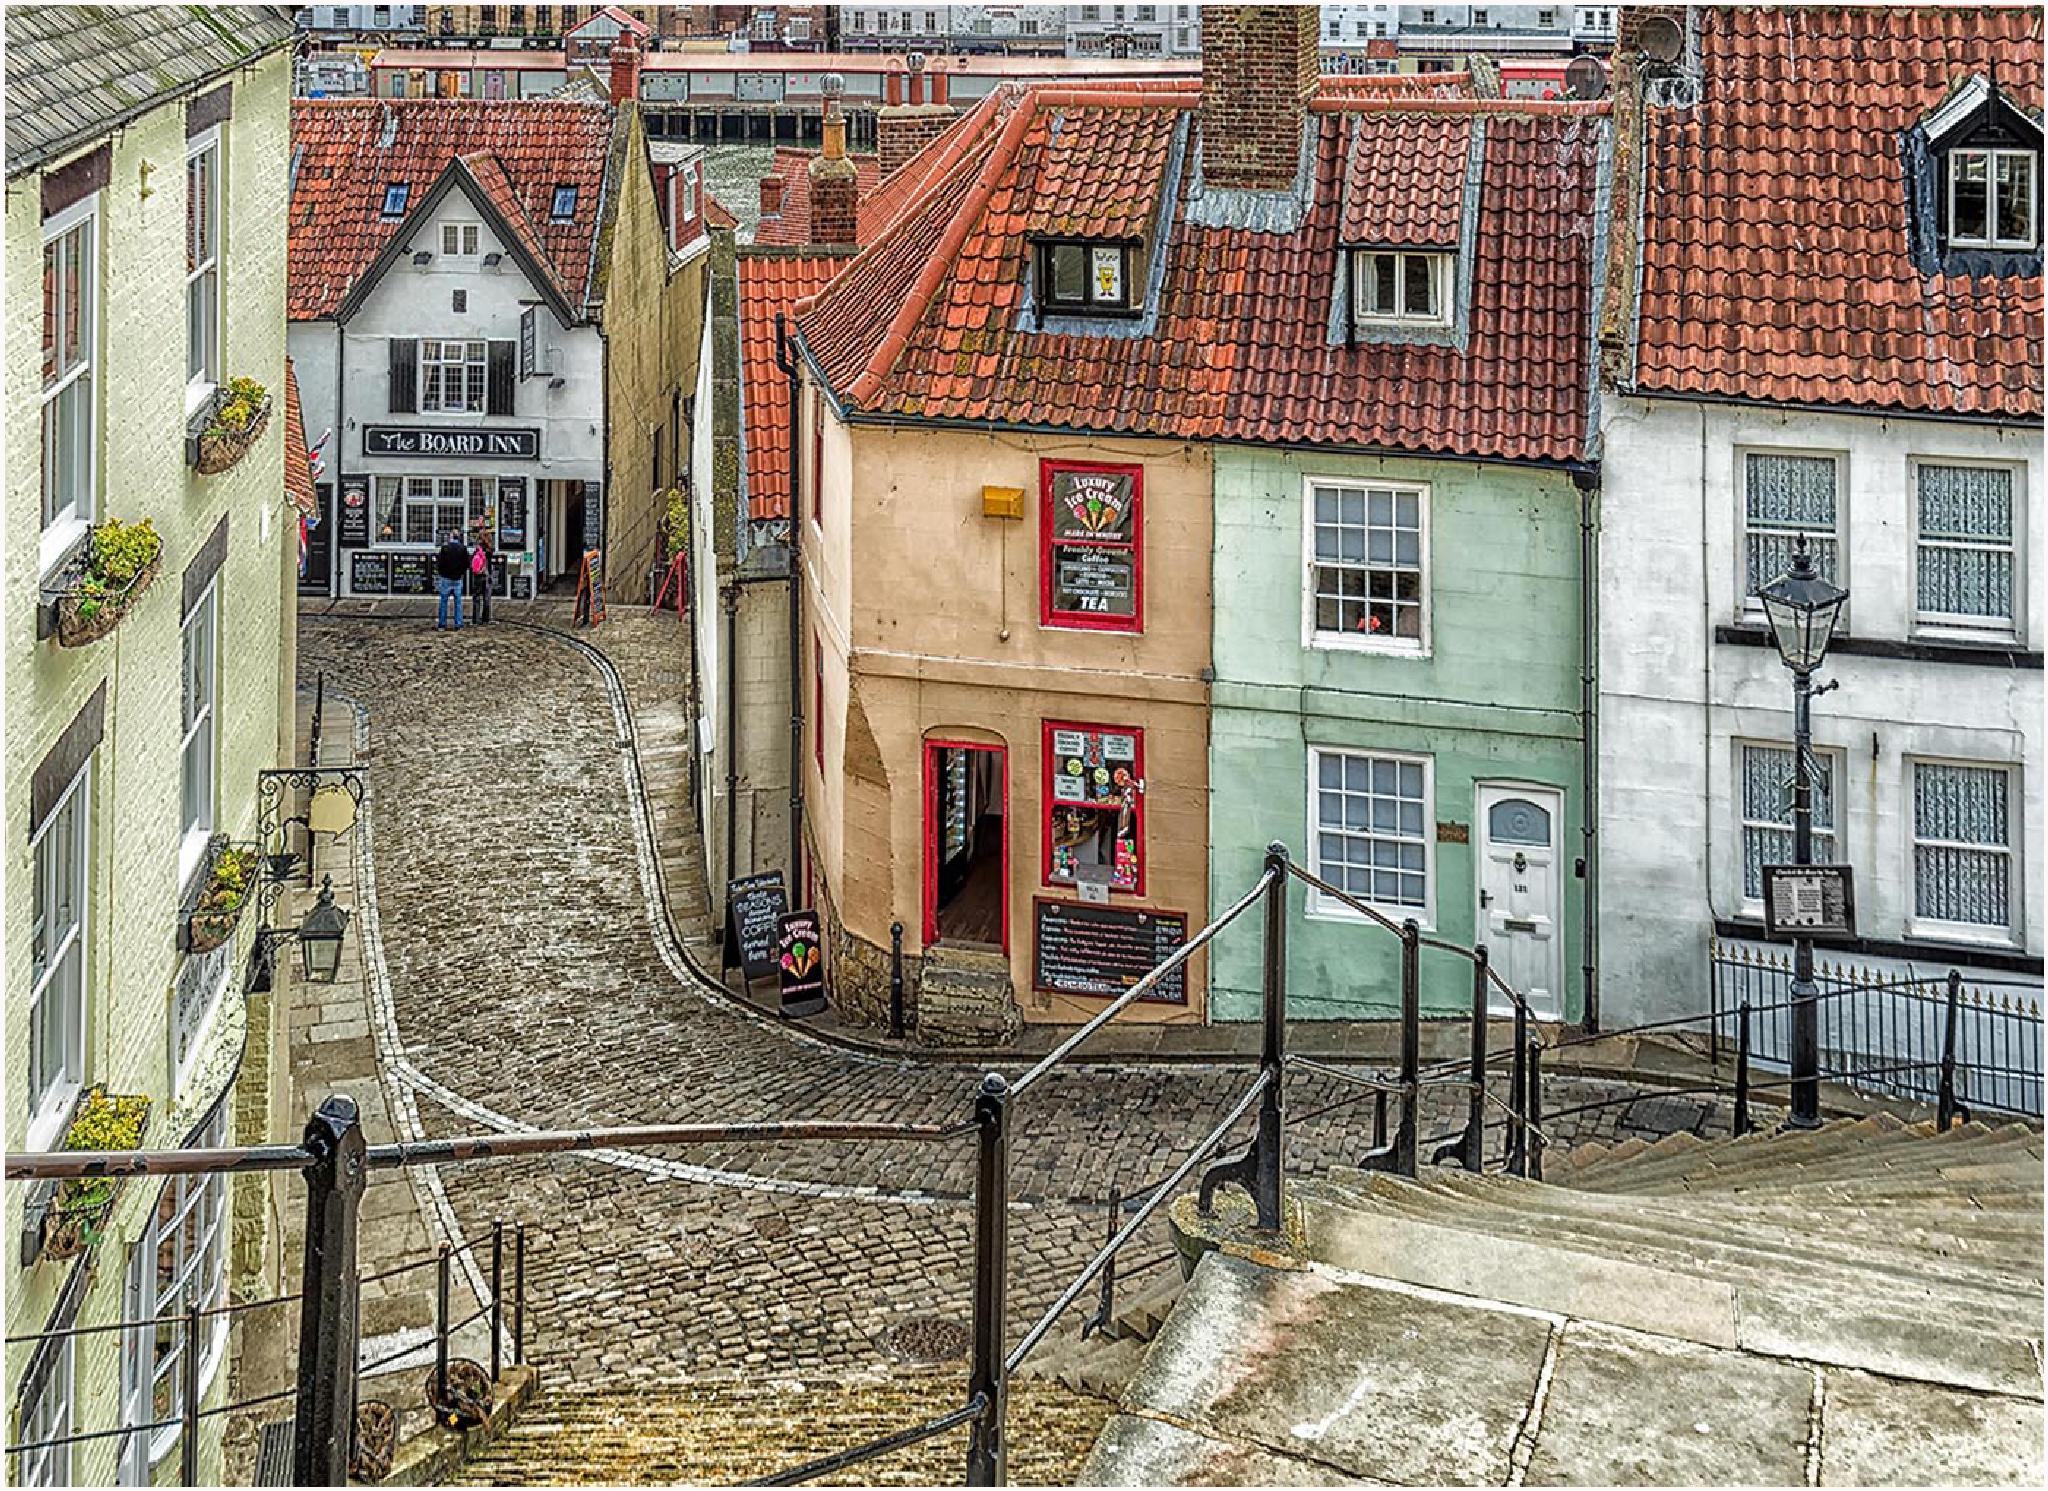 Abbey Steps Whitby by DaveJones